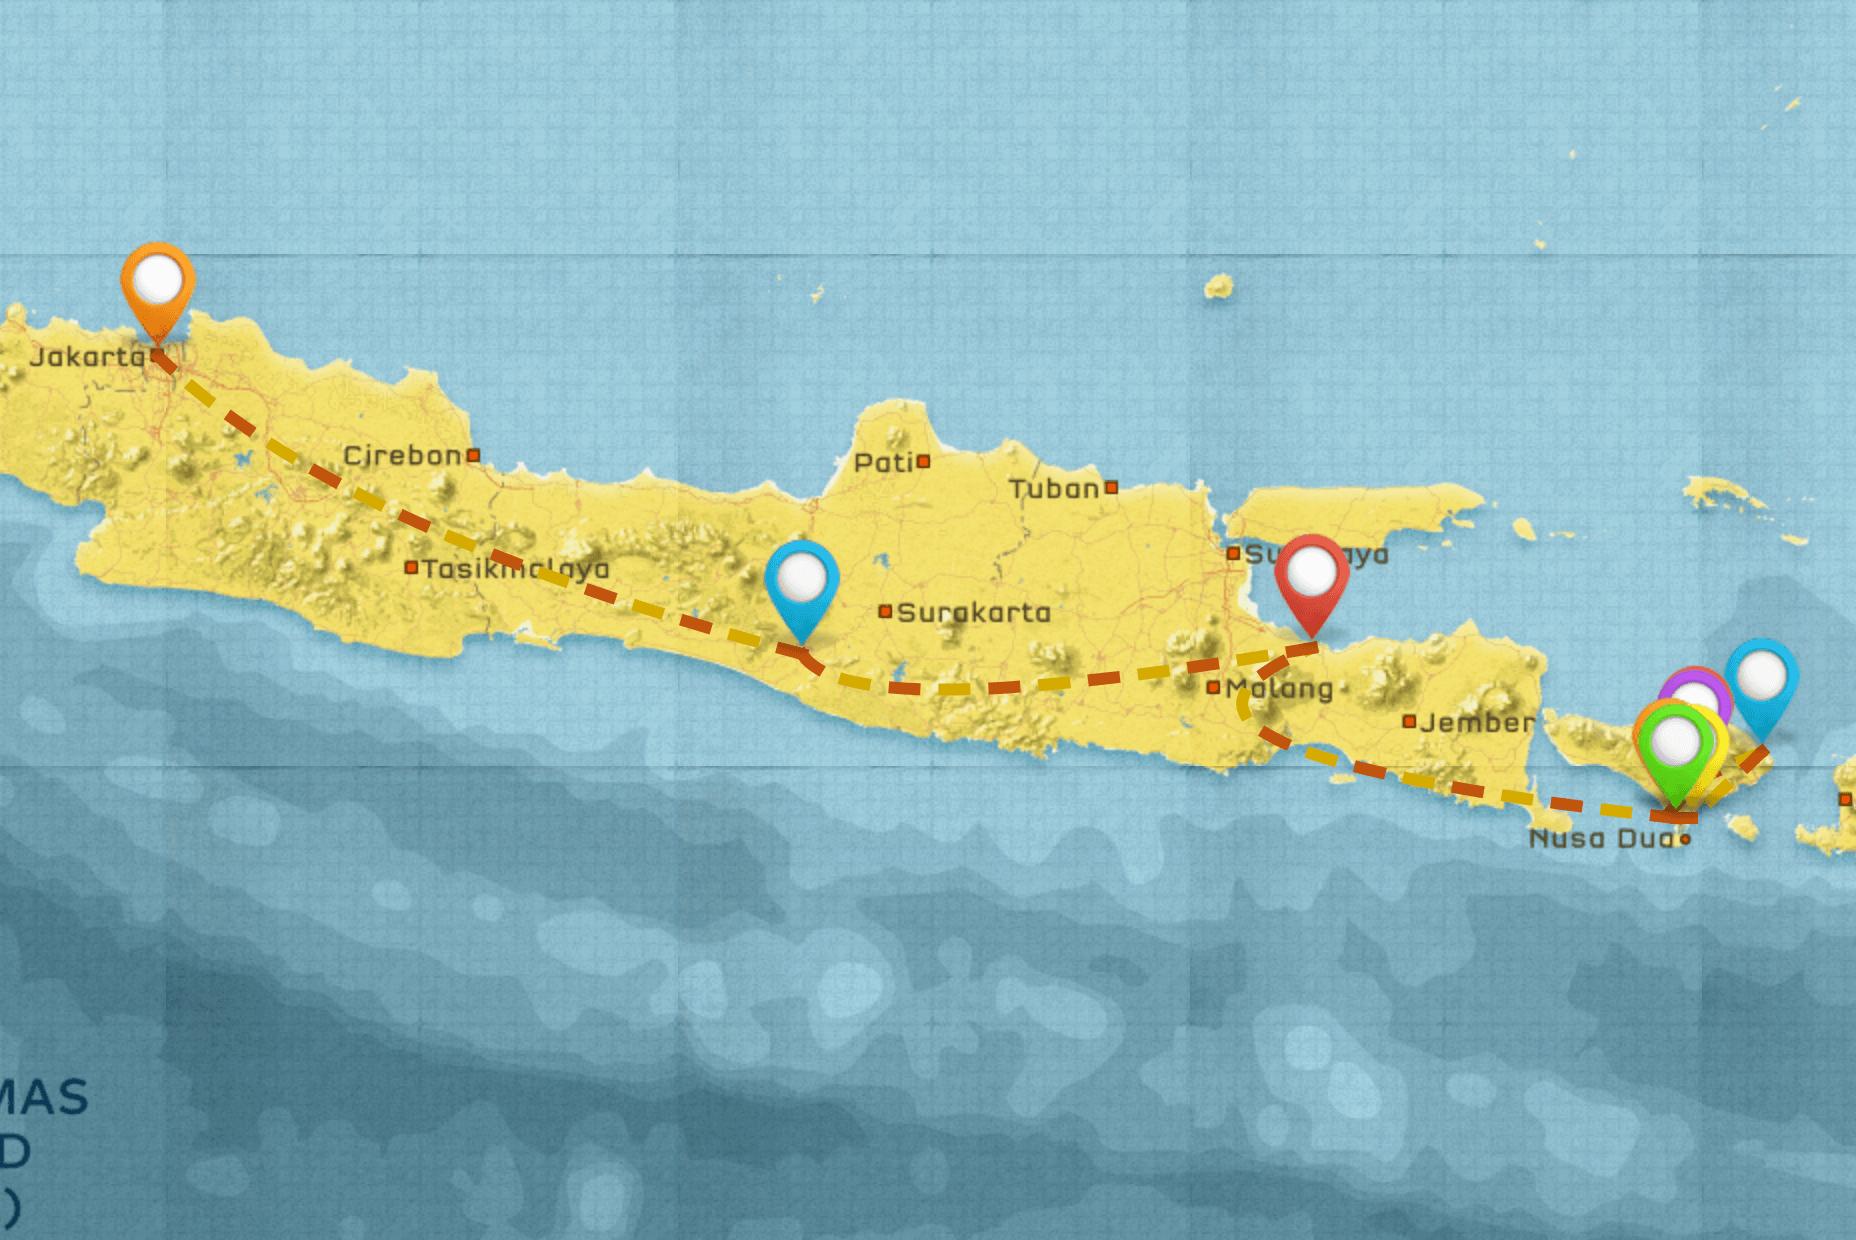 Java and Bali Indonesia Itinerary #2